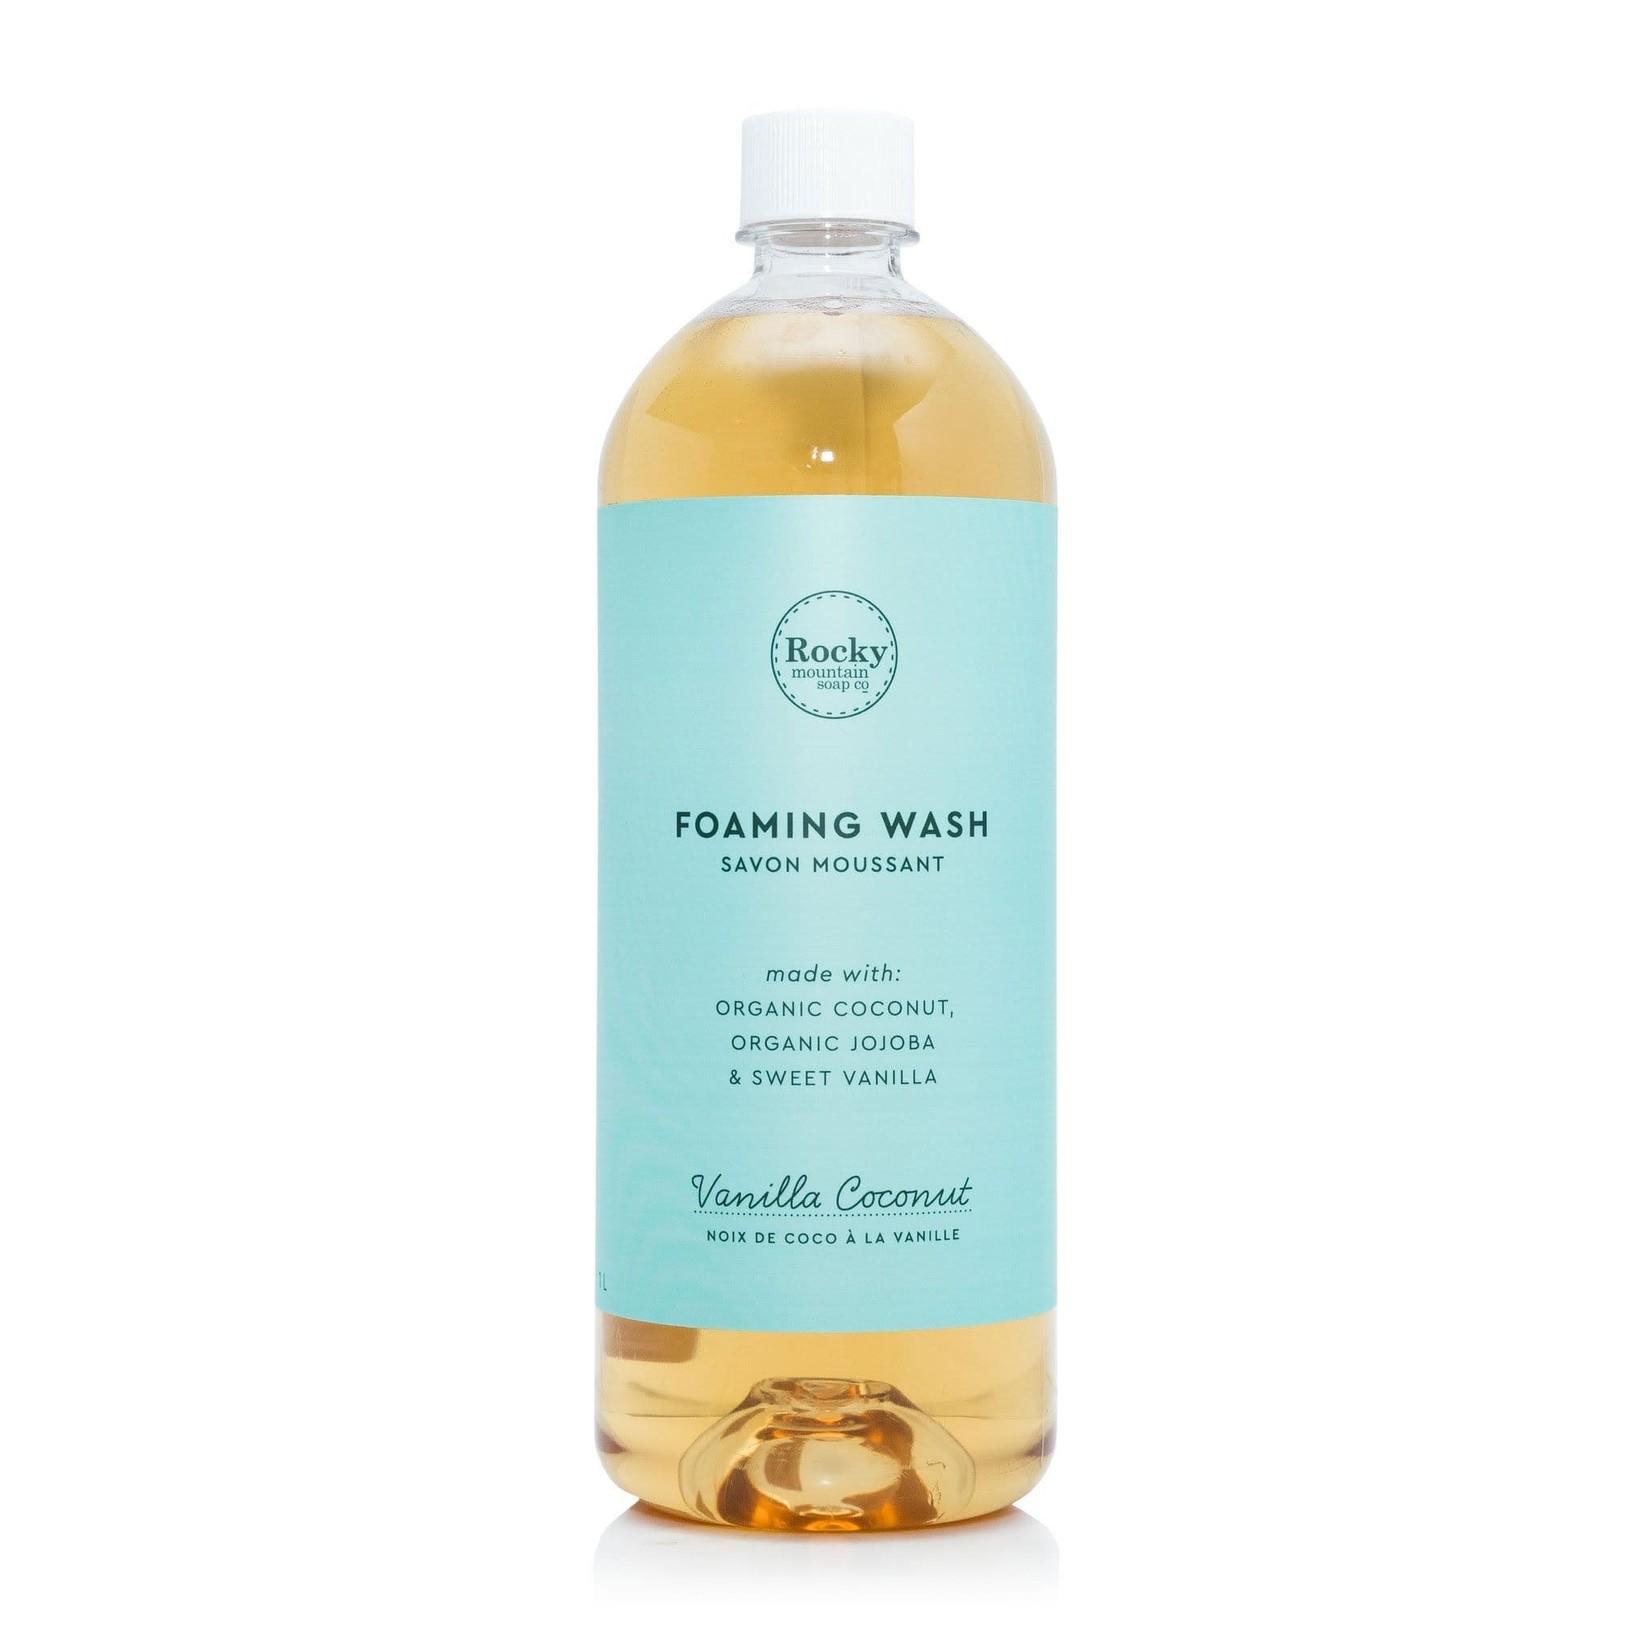 ROCKY MOUNTAIN SOAP CO. FOAMING WASH - VANILLA COCONUT